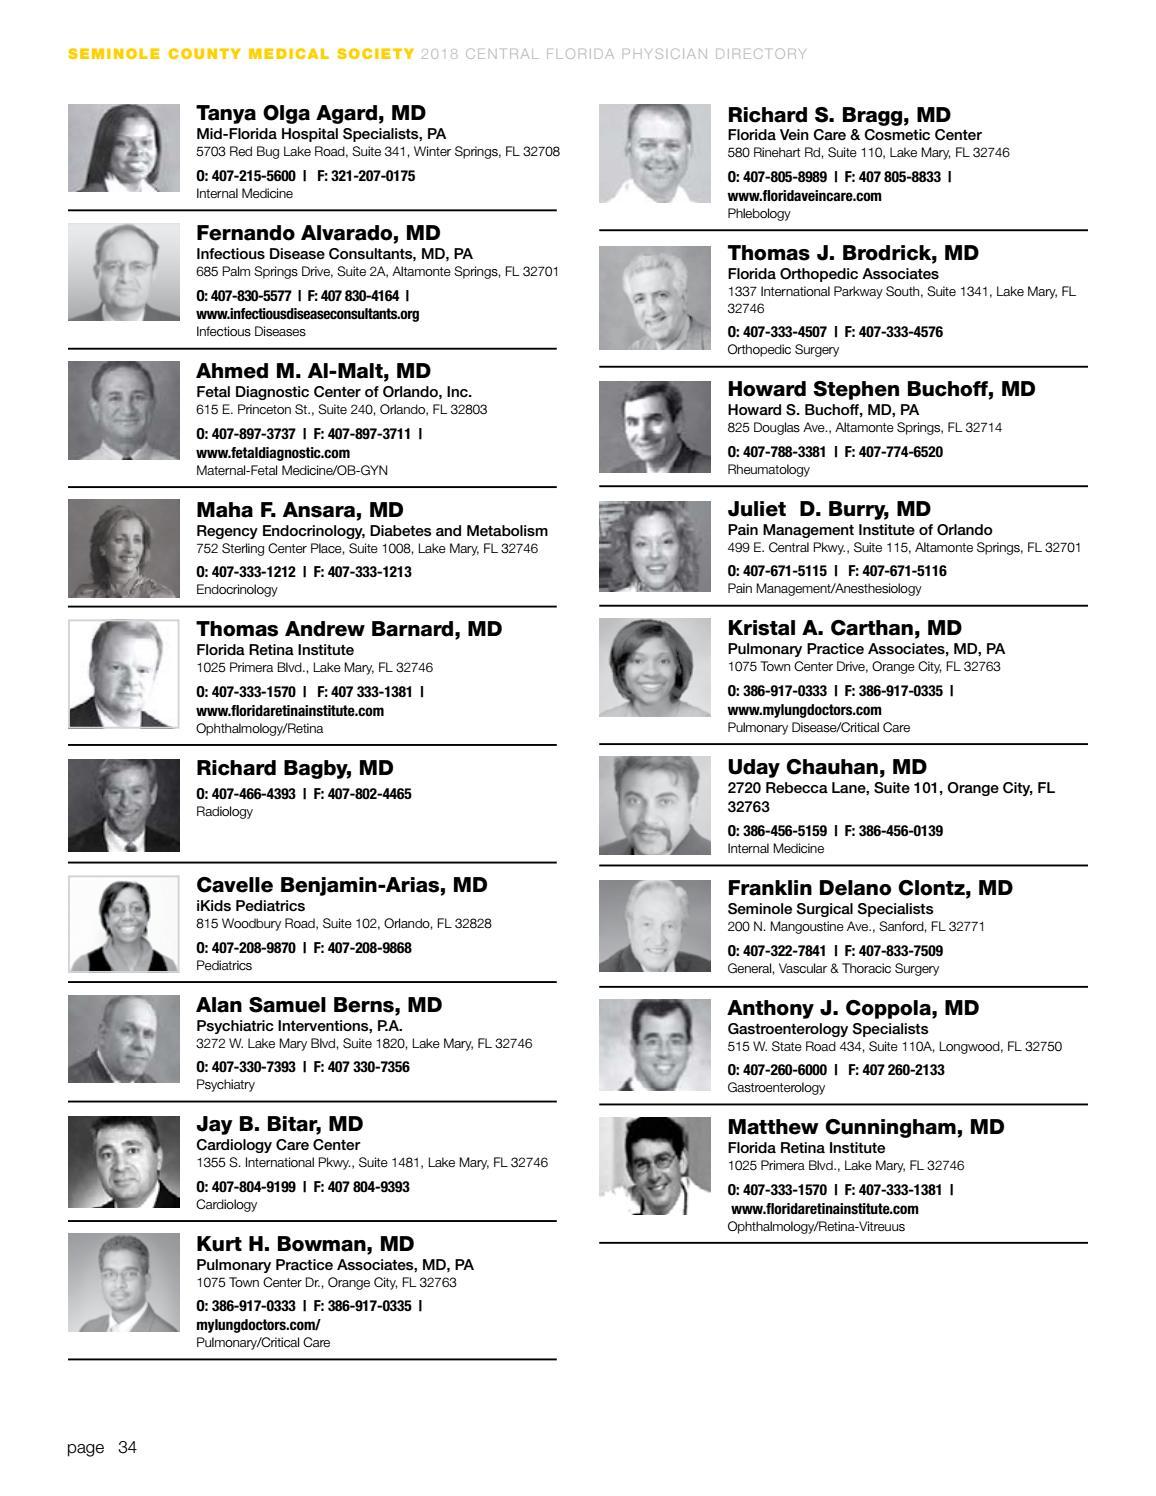 2018 Central Florida Physician Directory by Orlando Medical